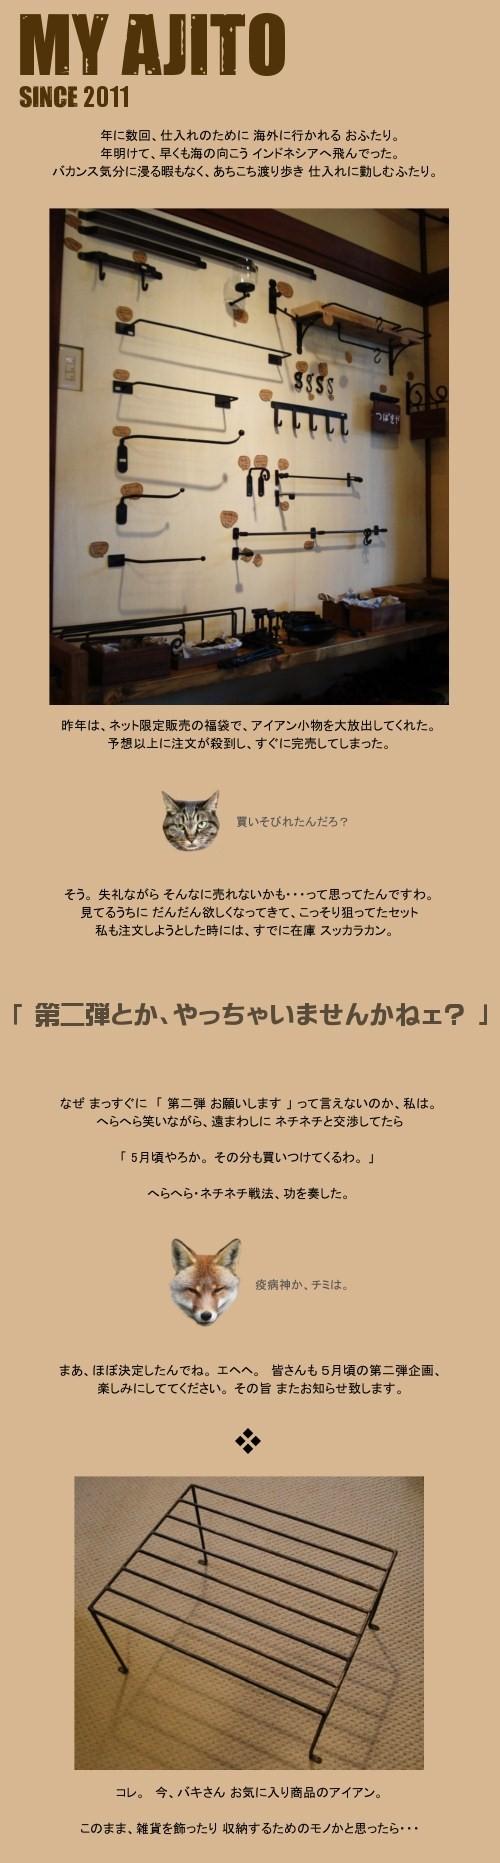 bu_02.jpg